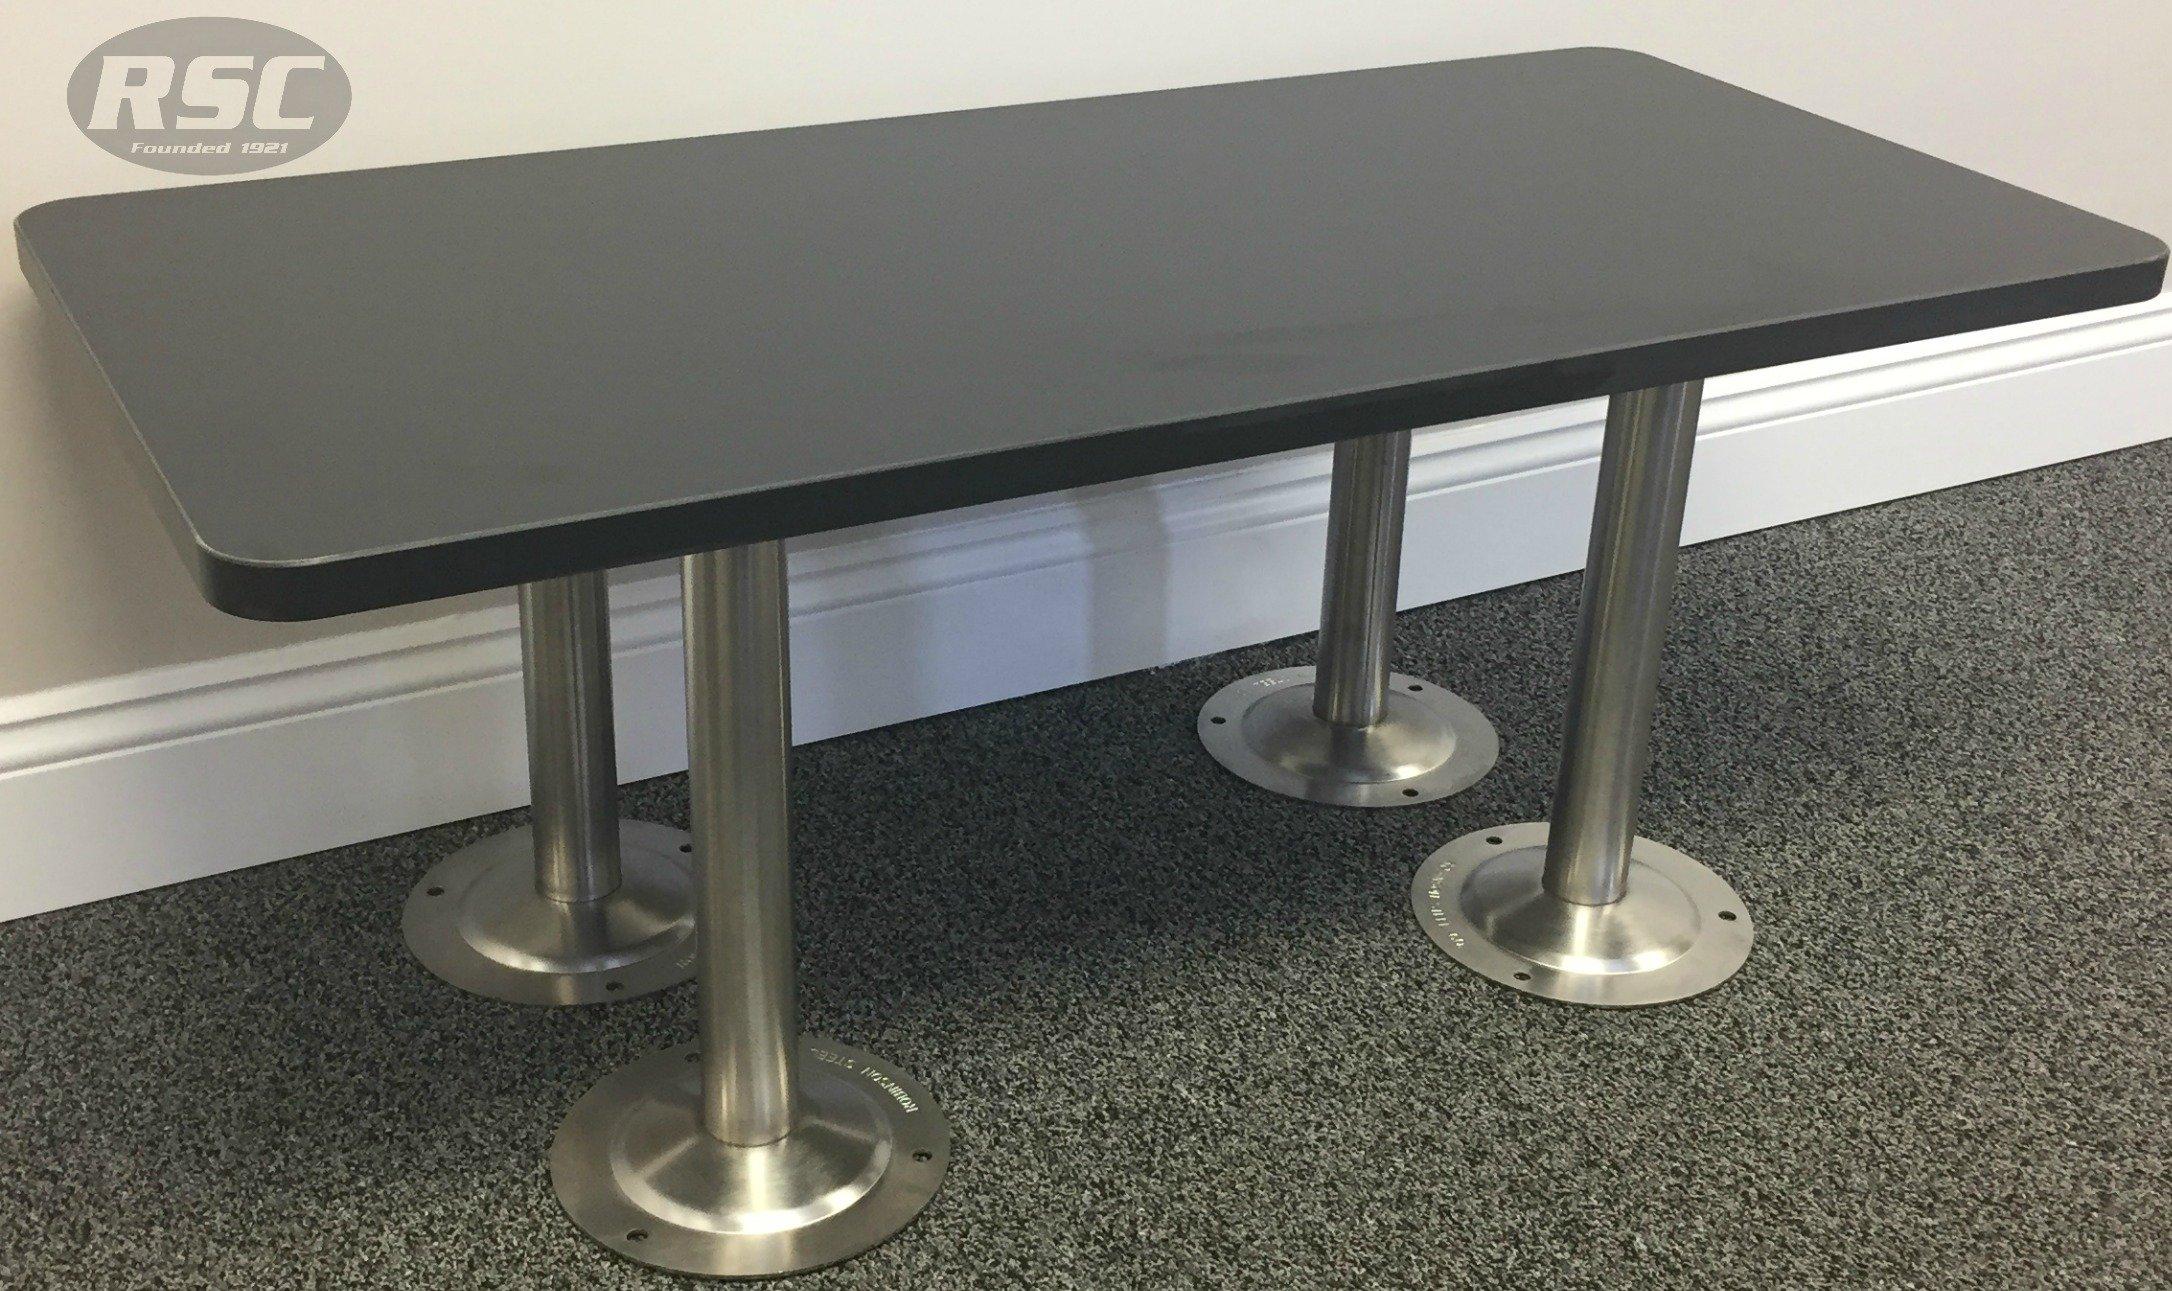 ADA Phenolic Locker Room Bench with #304 Stainless Steel Pedestals - 42'' L x 20'' W x 16.25'' H